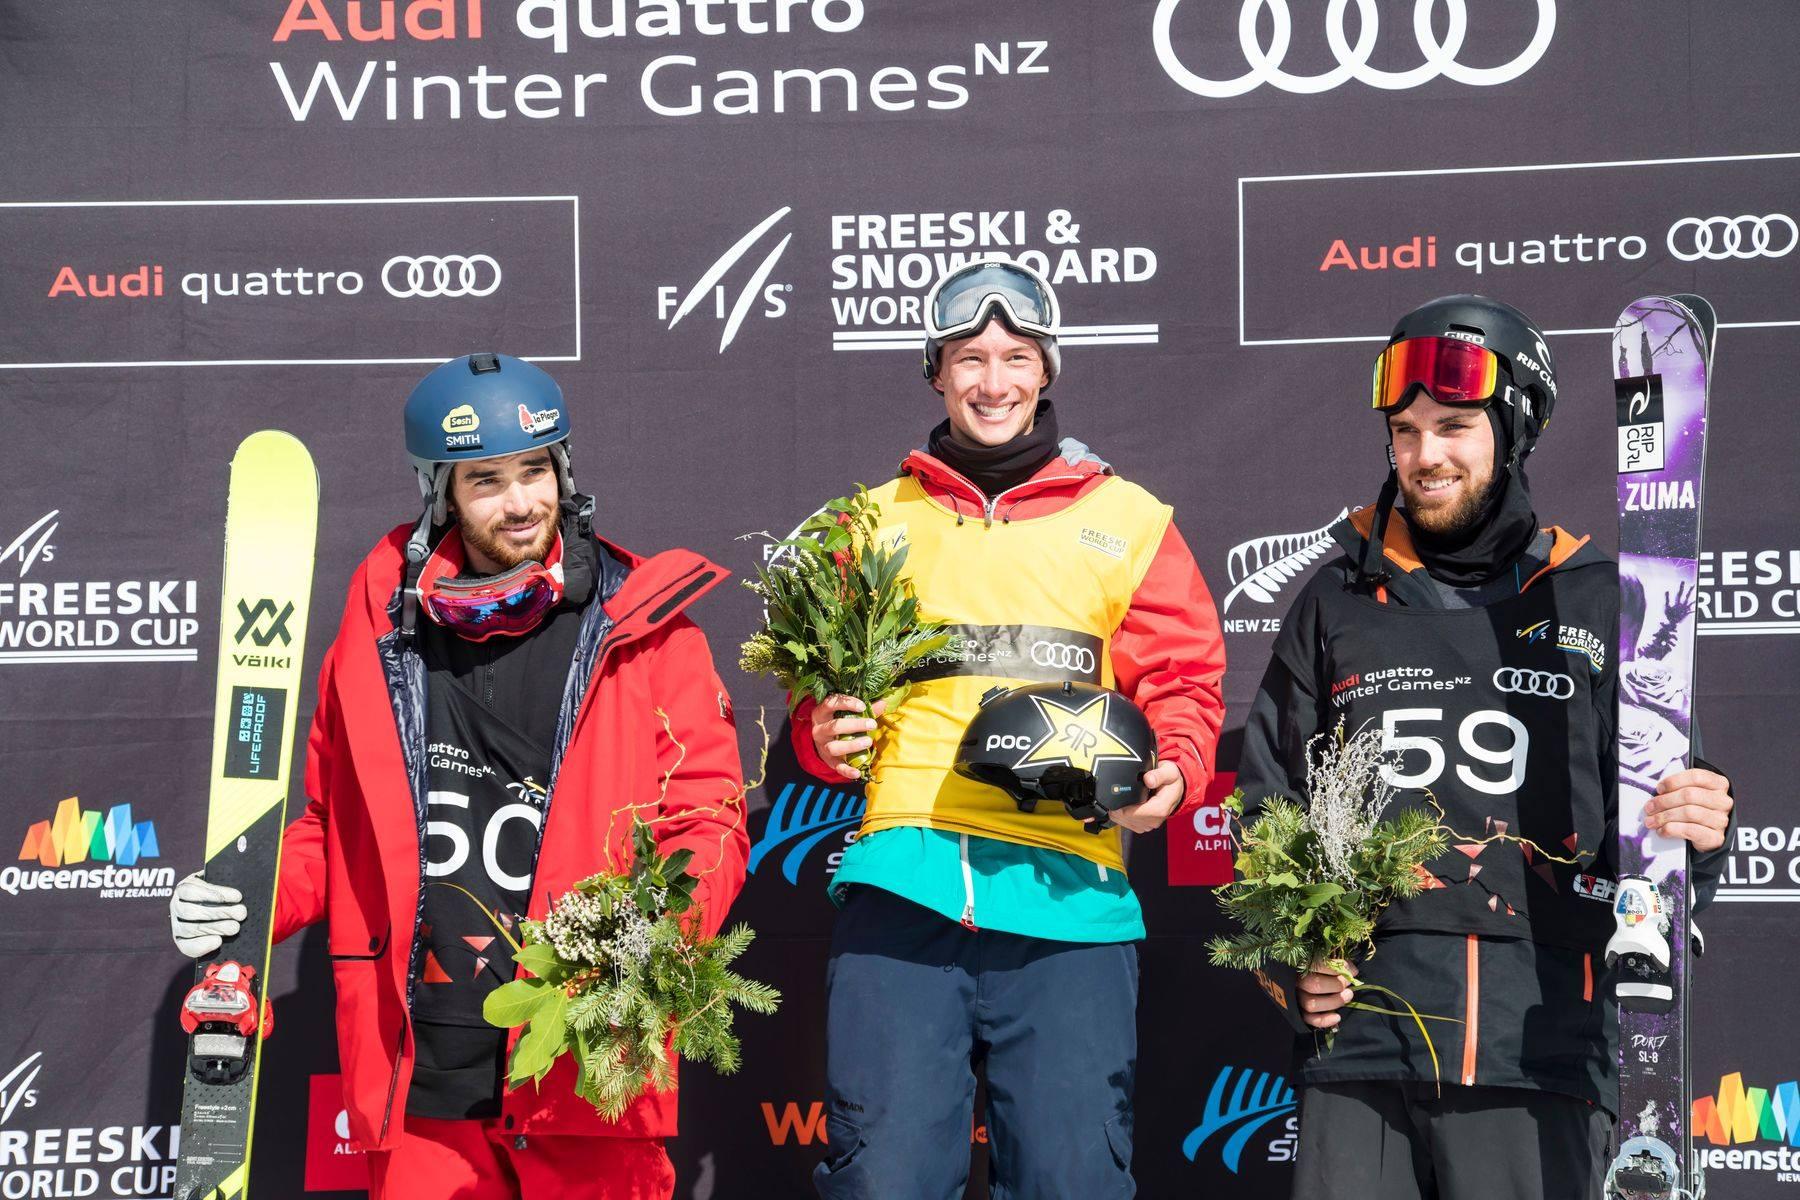 Die Top 3 Männer beim ersten FIS Halfpipe Contest der Saison 17/18: Kevin Rolland (FRA), Alex Ferreira (USA), Simon d'Artois Skiing (CAN) (v.l.n.r.) - Foto: FIS Freestyle / Neil Kerr / Winter Games